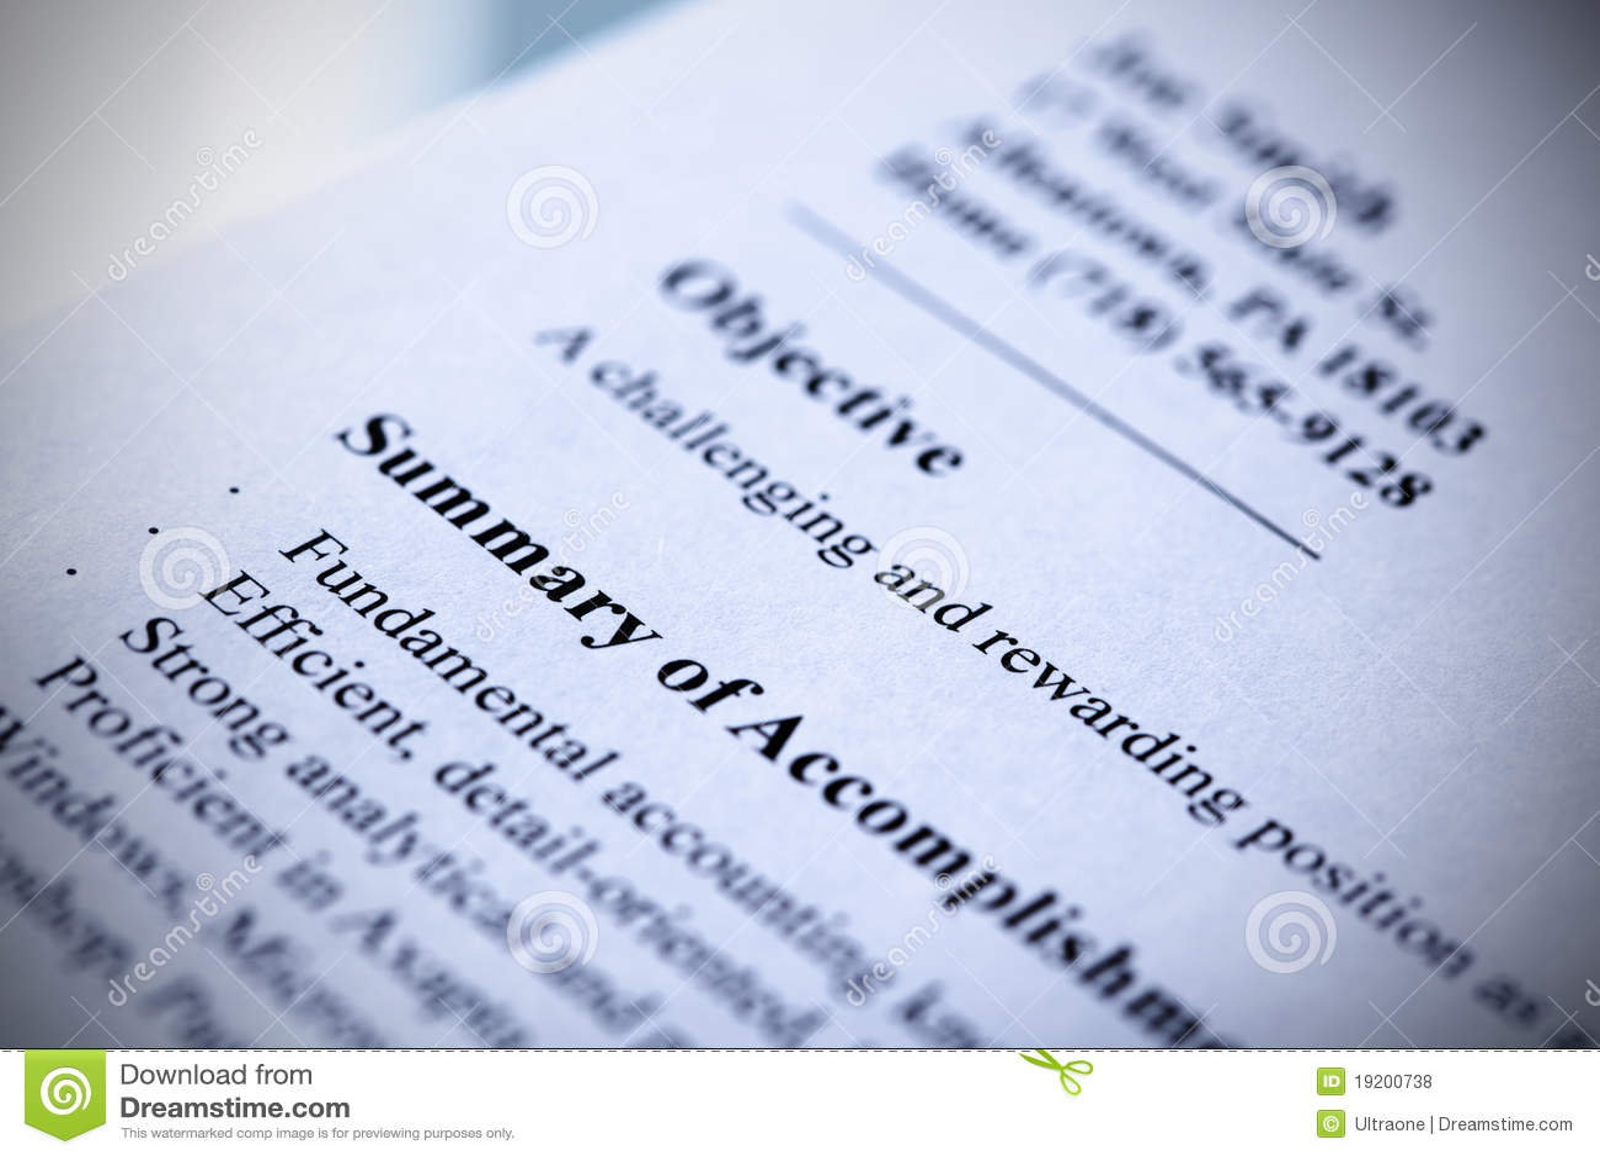 Modern Resume Close up Royalty Free Stock s Image